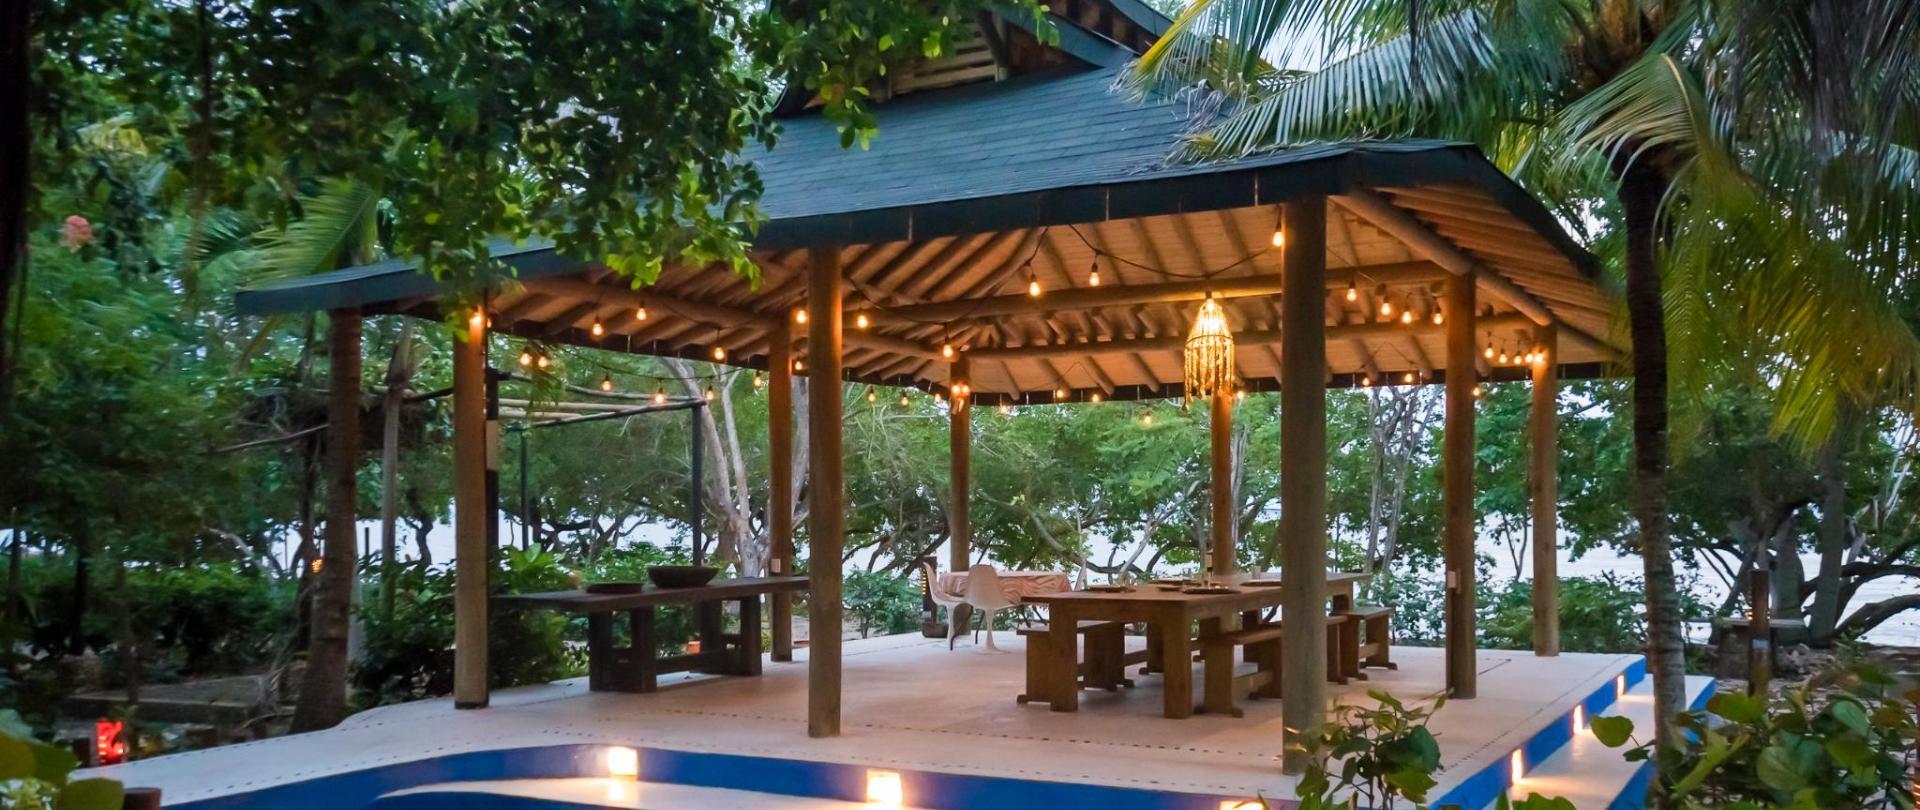 20171130-Dining Playa Manglares-21.jpg